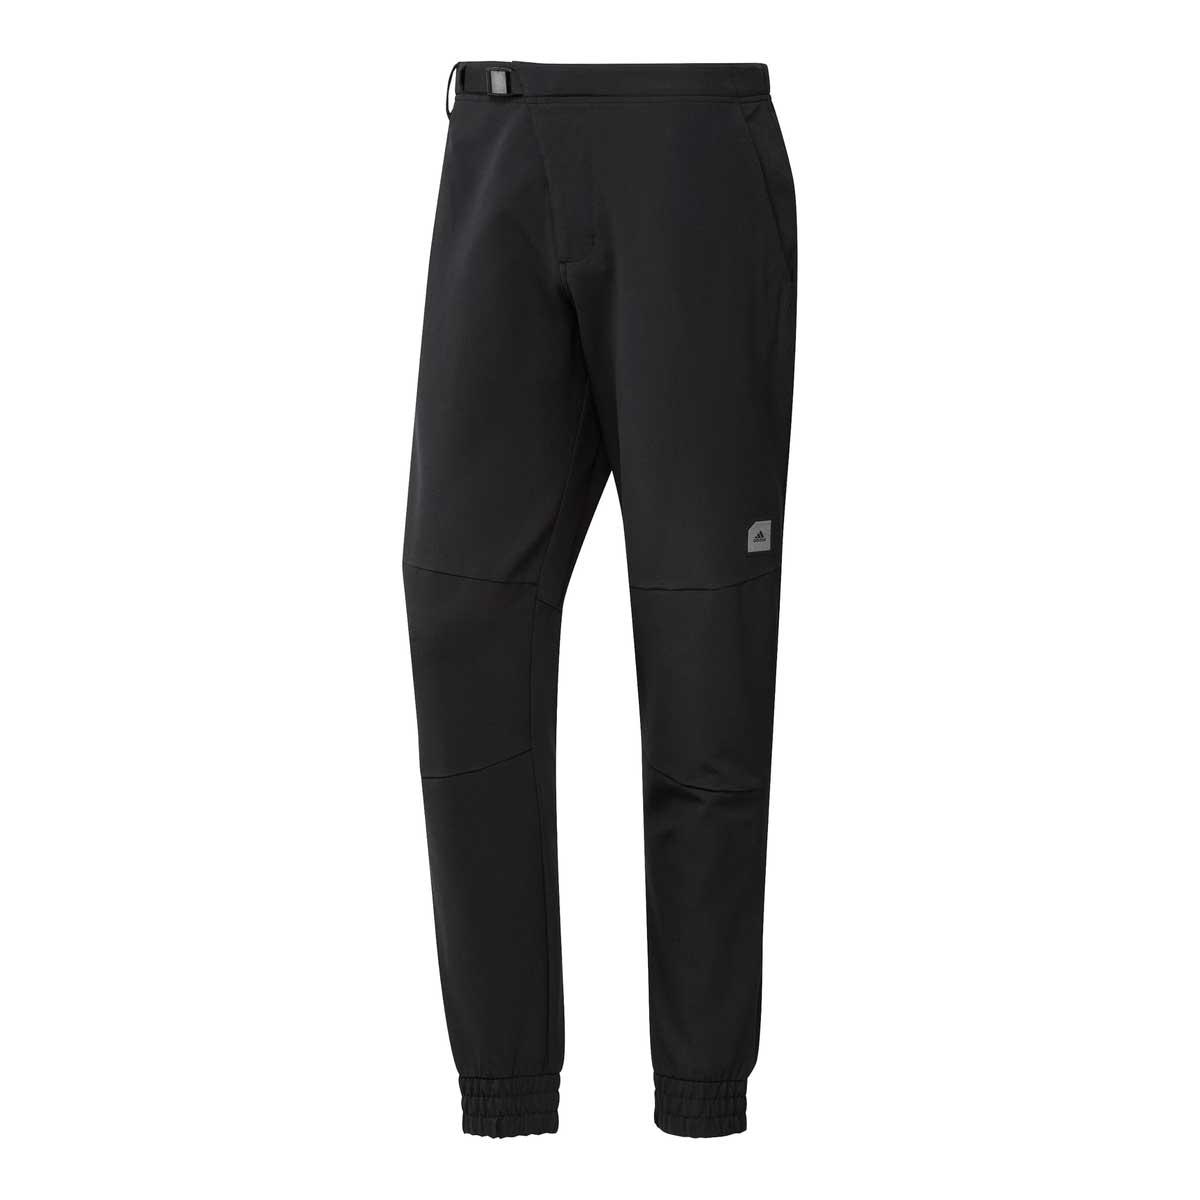 Adidas Men's Adicross Black Woven Jogger Pant